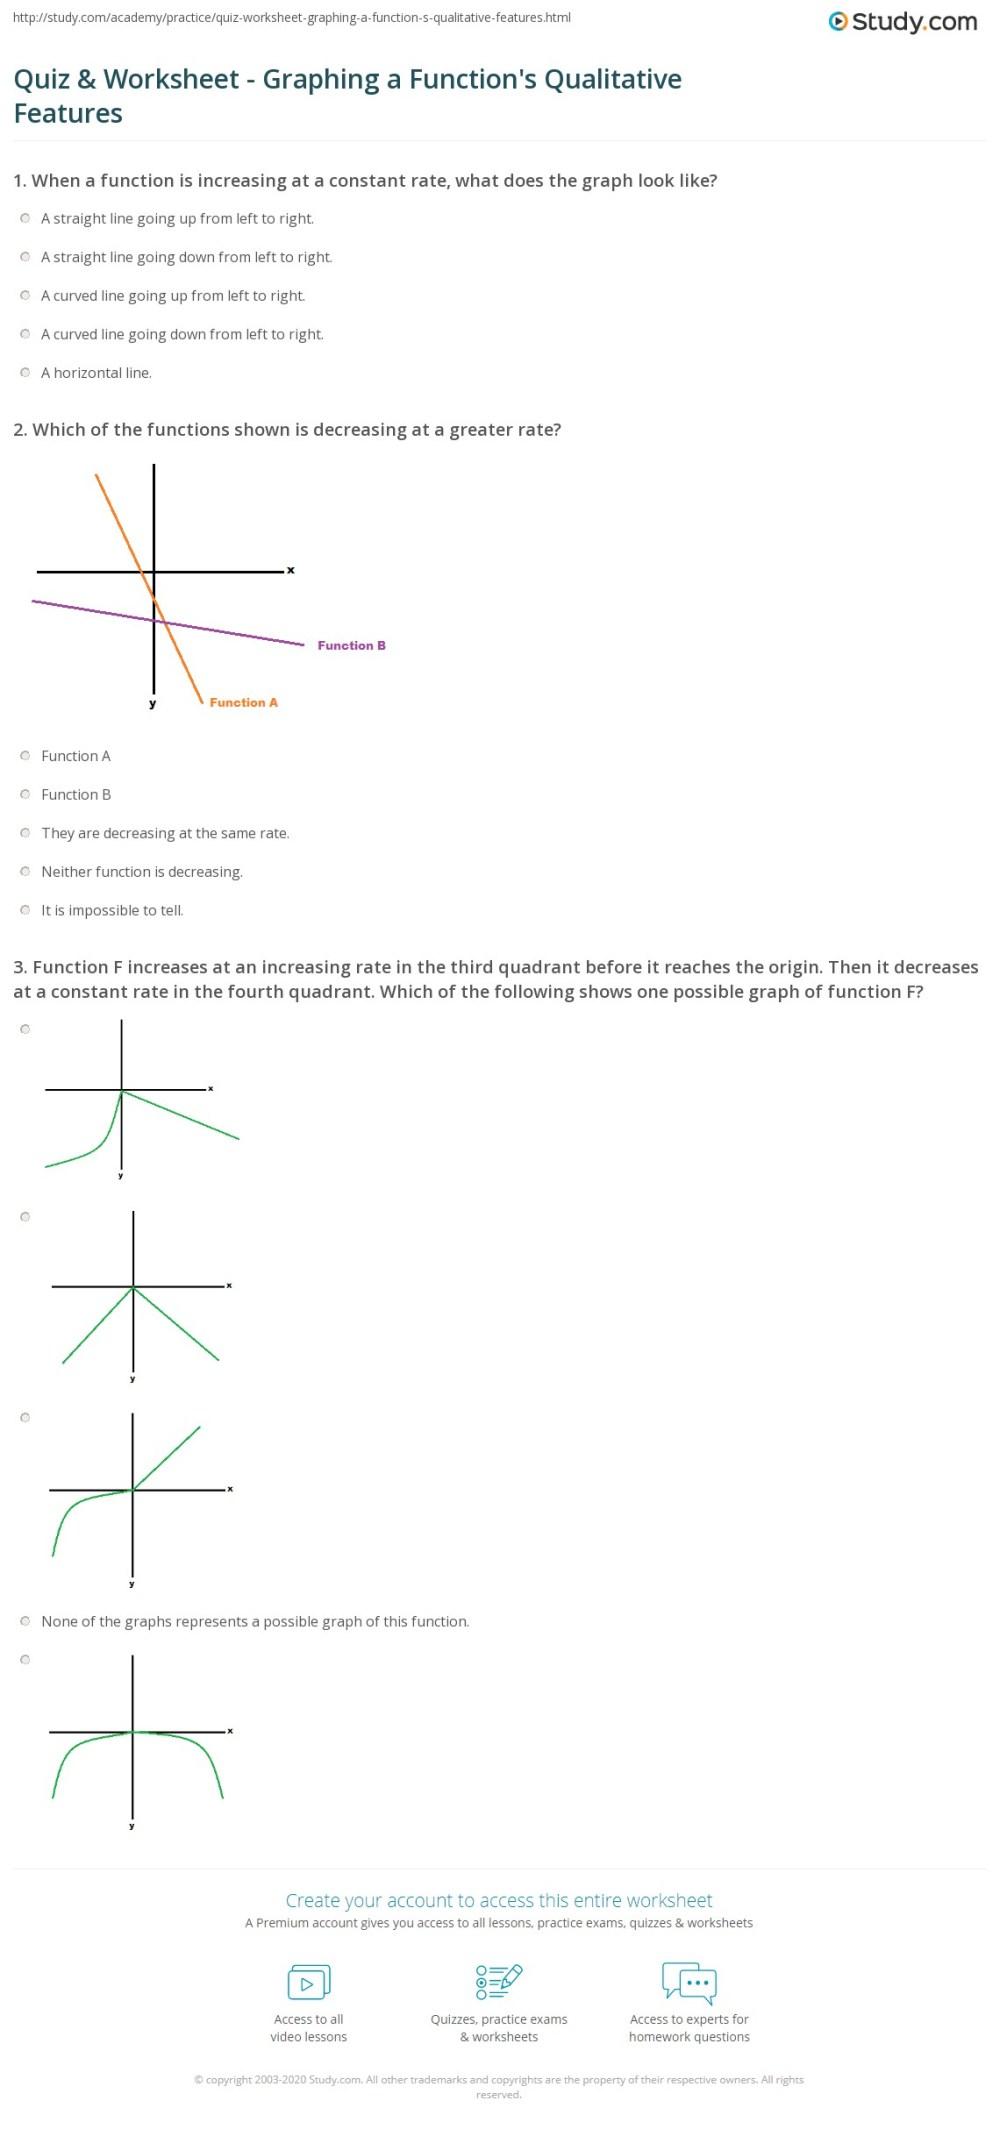 medium resolution of Quiz \u0026 Worksheet - Graphing a Function's Qualitative Features   Study.com